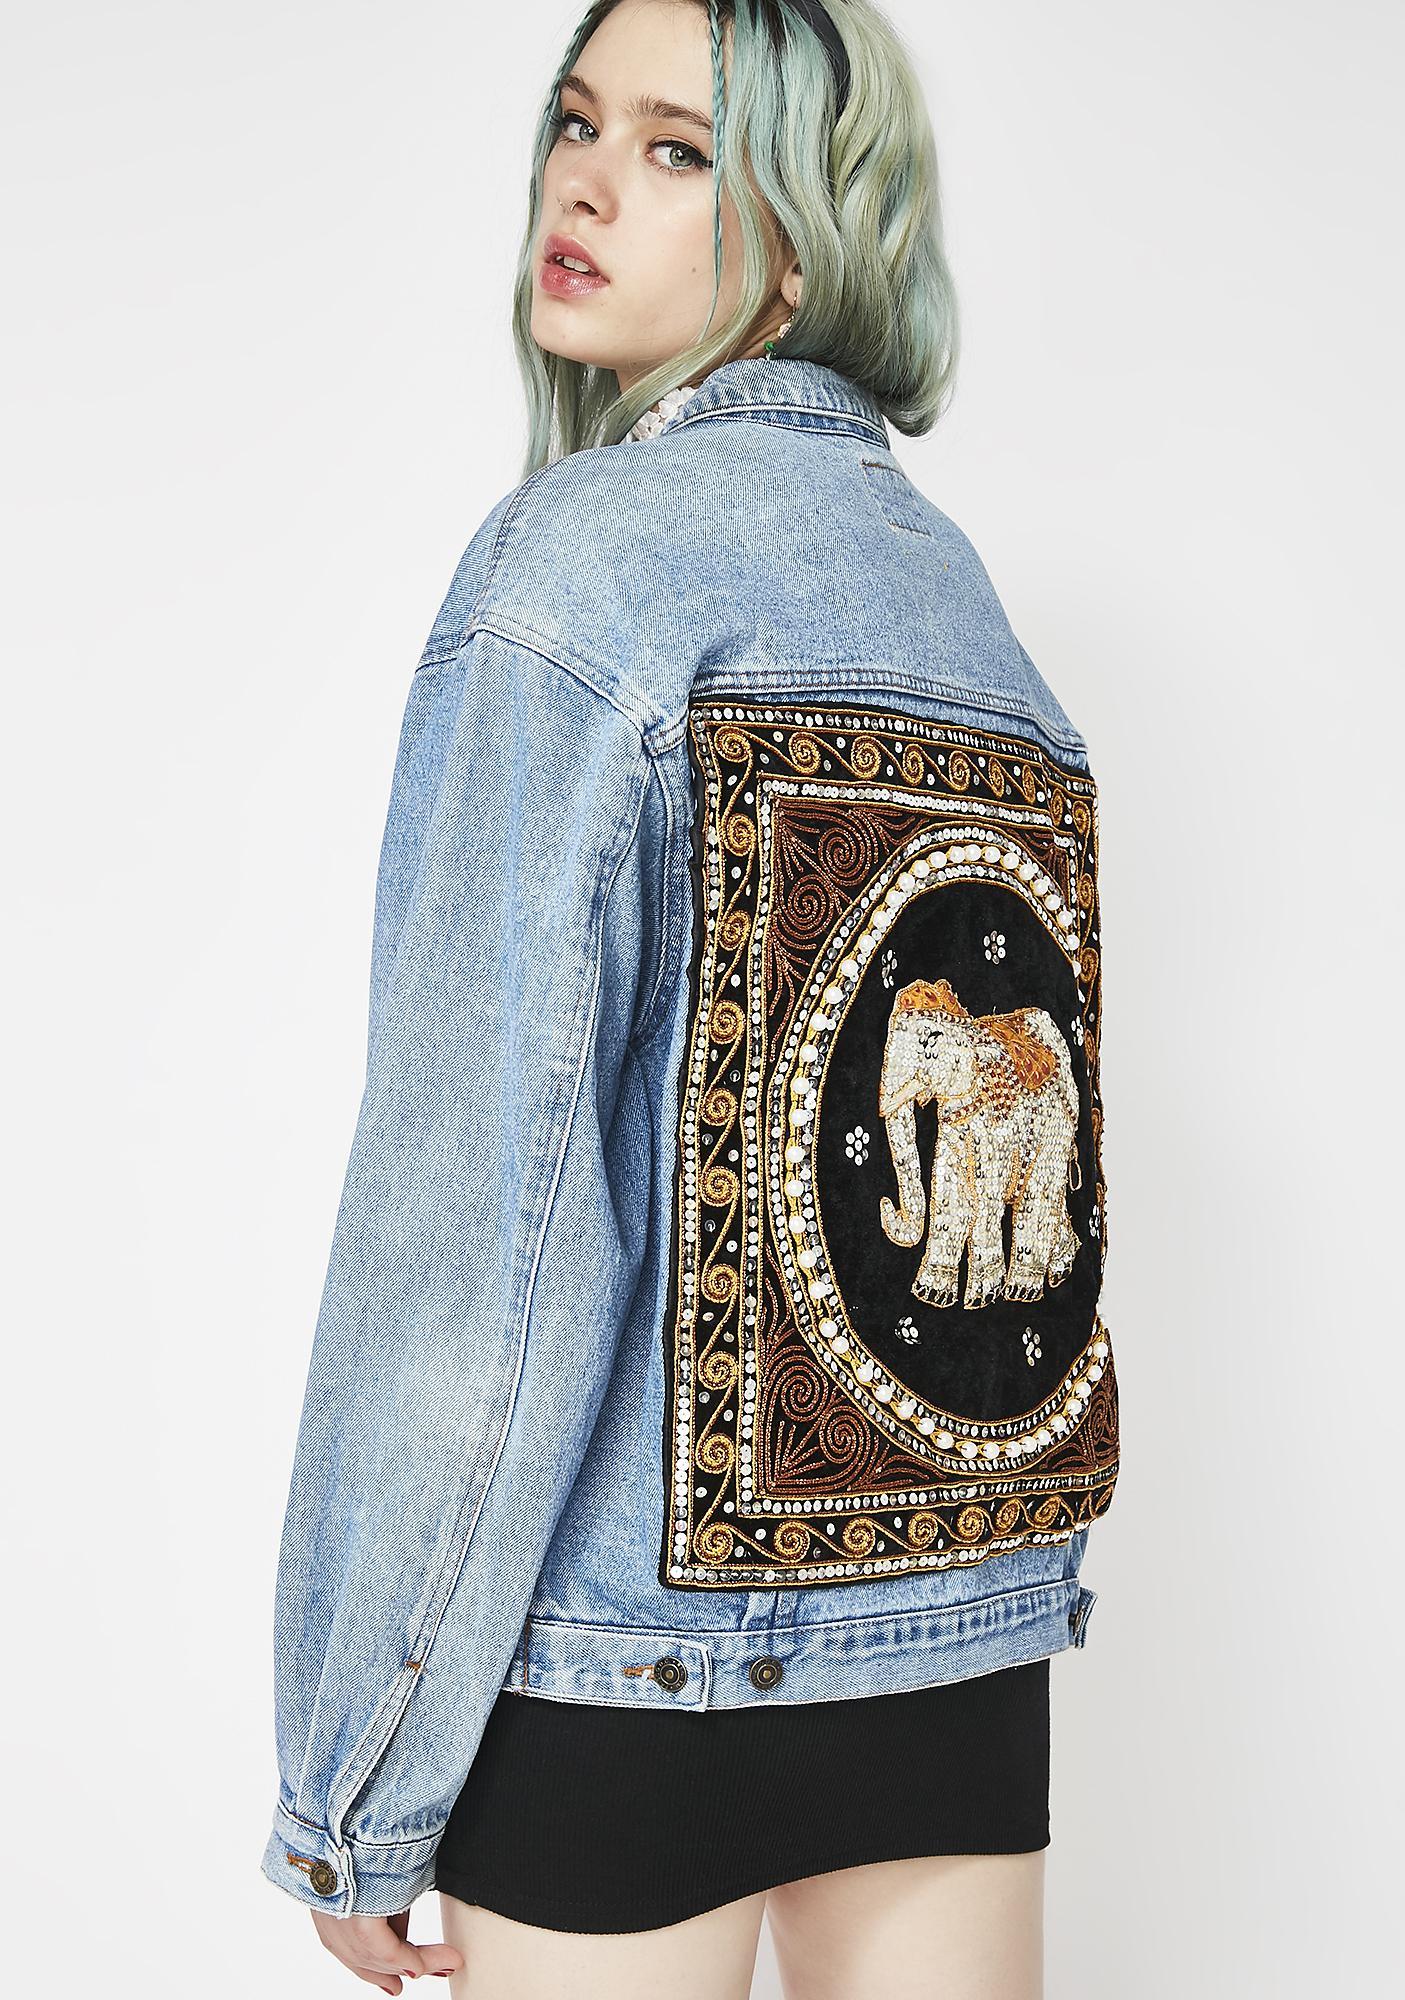 Elsie & Fred Boho Baddie Embroidered Jacket